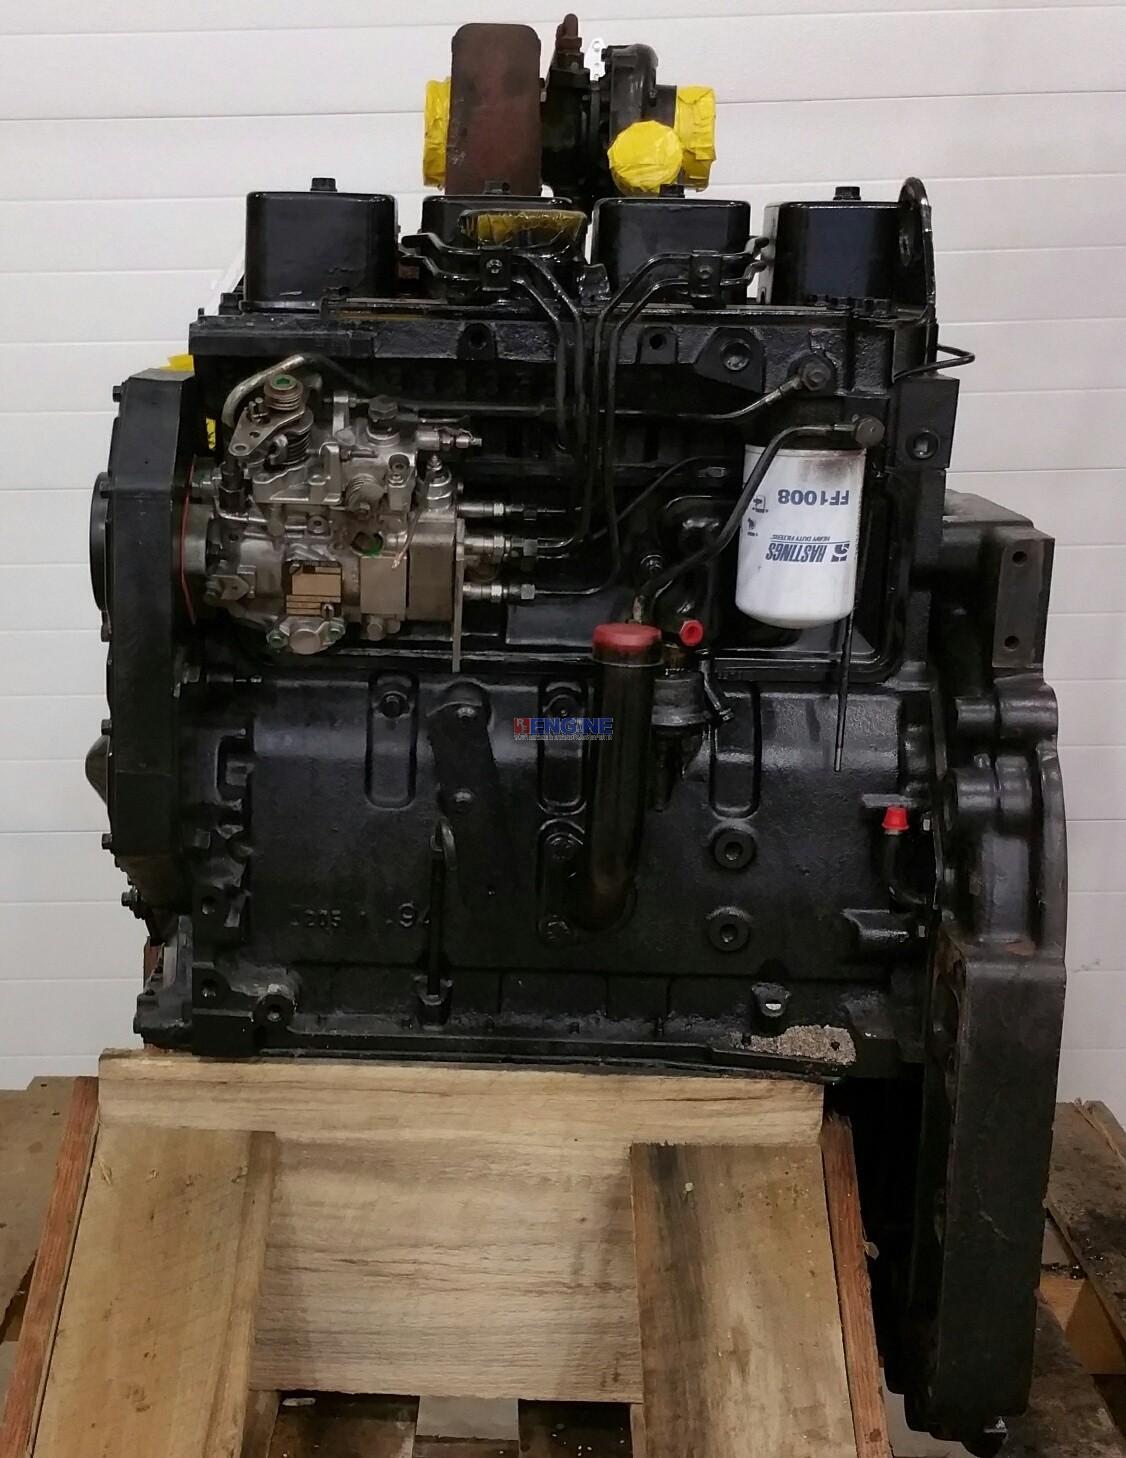 Cm Bbalanced Ldn on Wisconsin Engine Cylinder Head